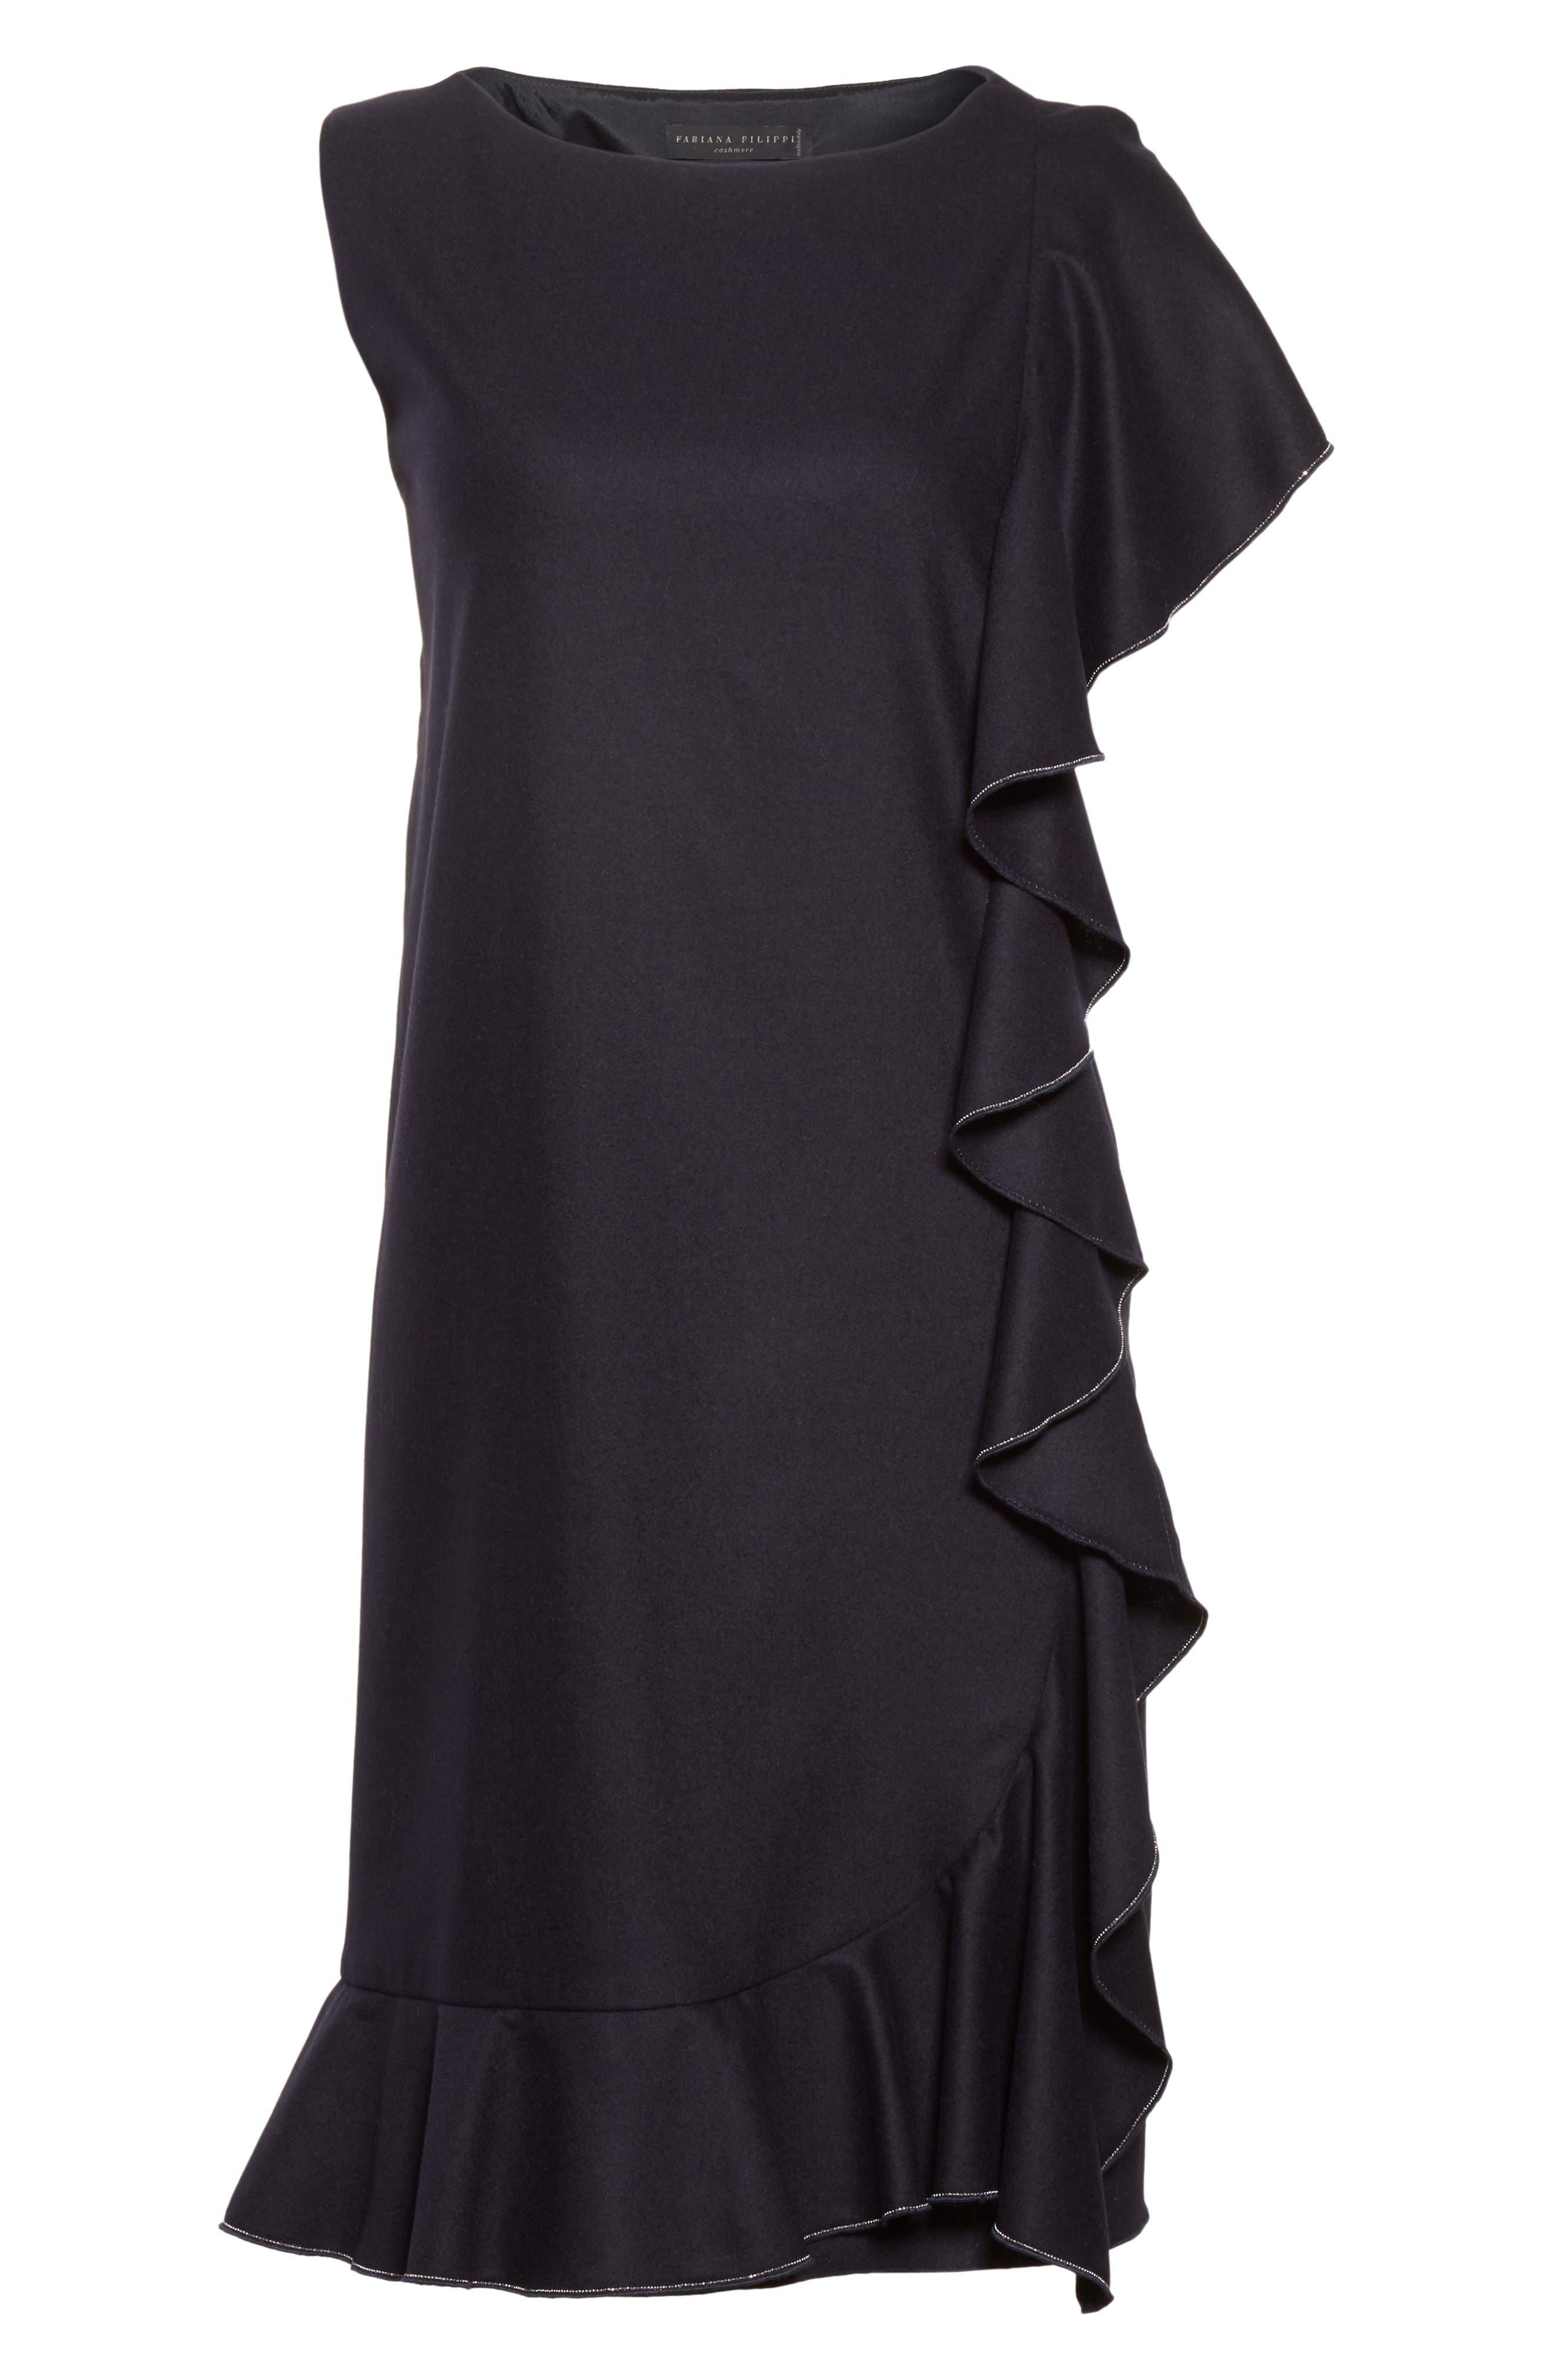 FABIANA FILIPPI,                             Stretch Wool & Cashmere Ruffle Dress,                             Alternate thumbnail 6, color,                             400